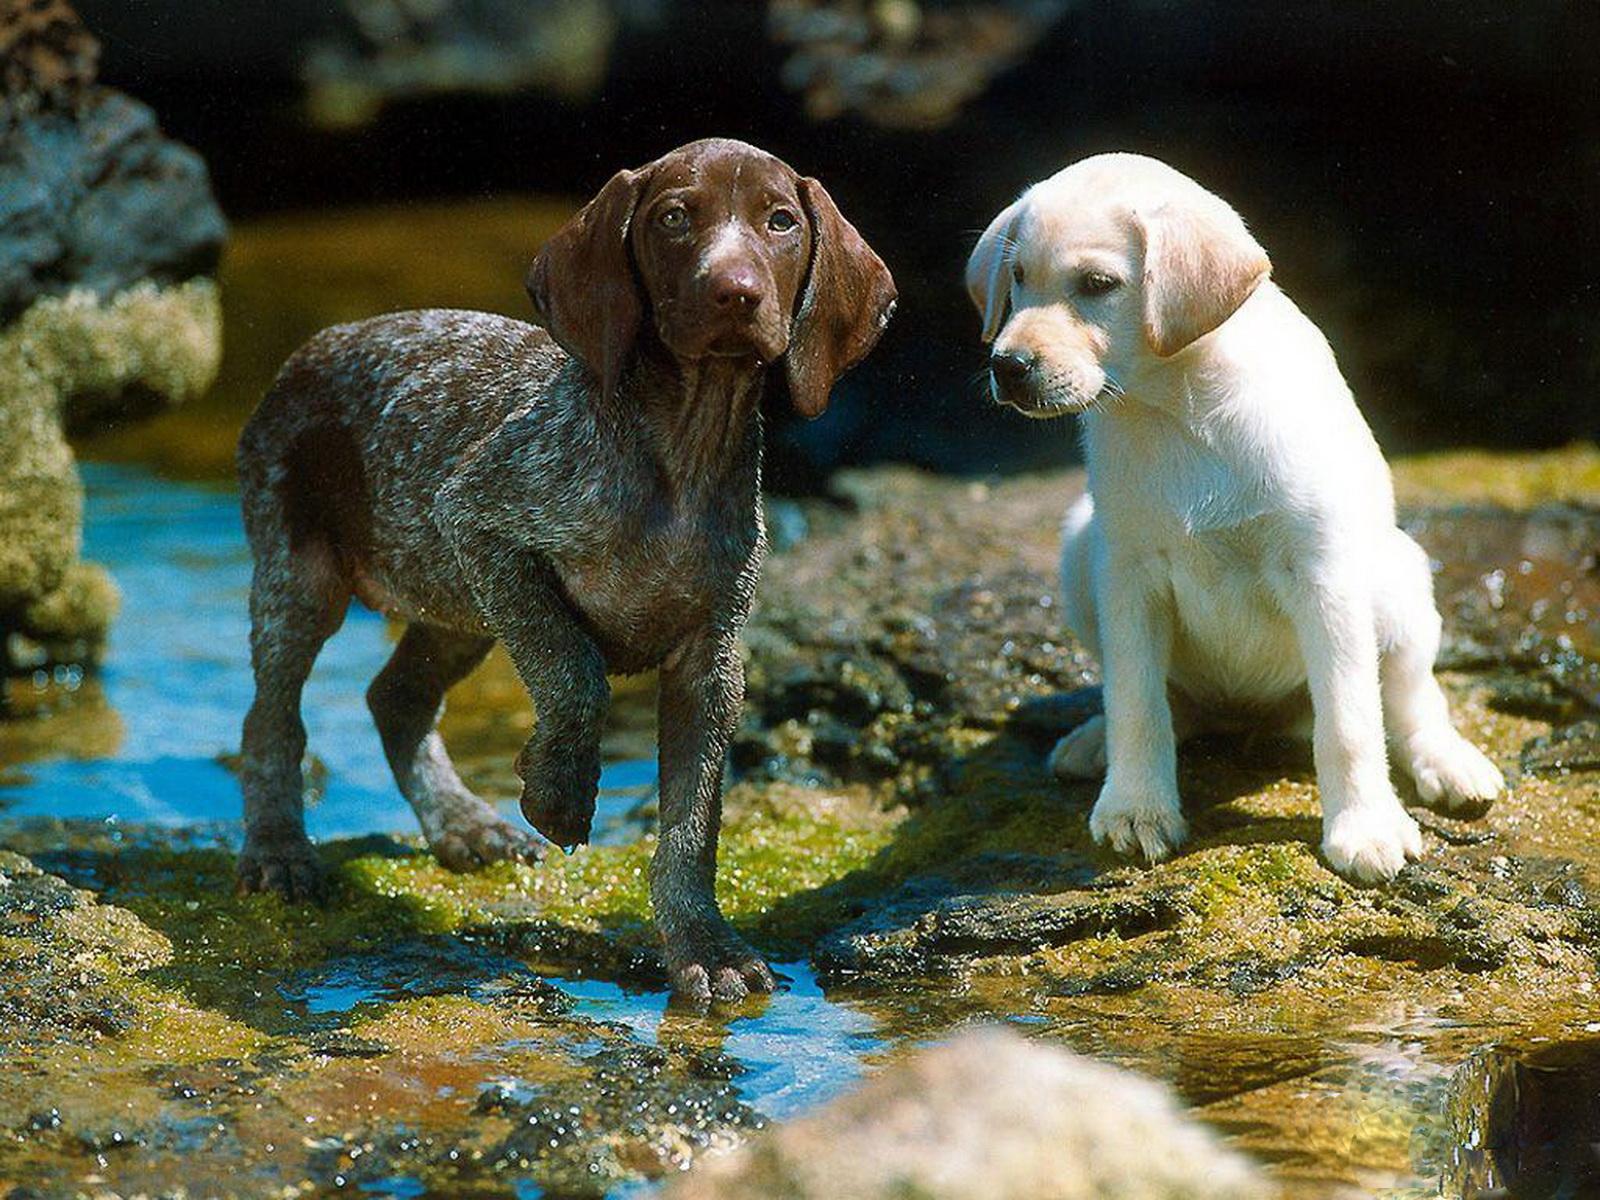 http://1.bp.blogspot.com/-89Hrq_4-wA8/Tyw8WmmALCI/AAAAAAAAA2k/6RZ6iPOZH8U/s1600/16-Cute+Dog+1600x1200.jpg